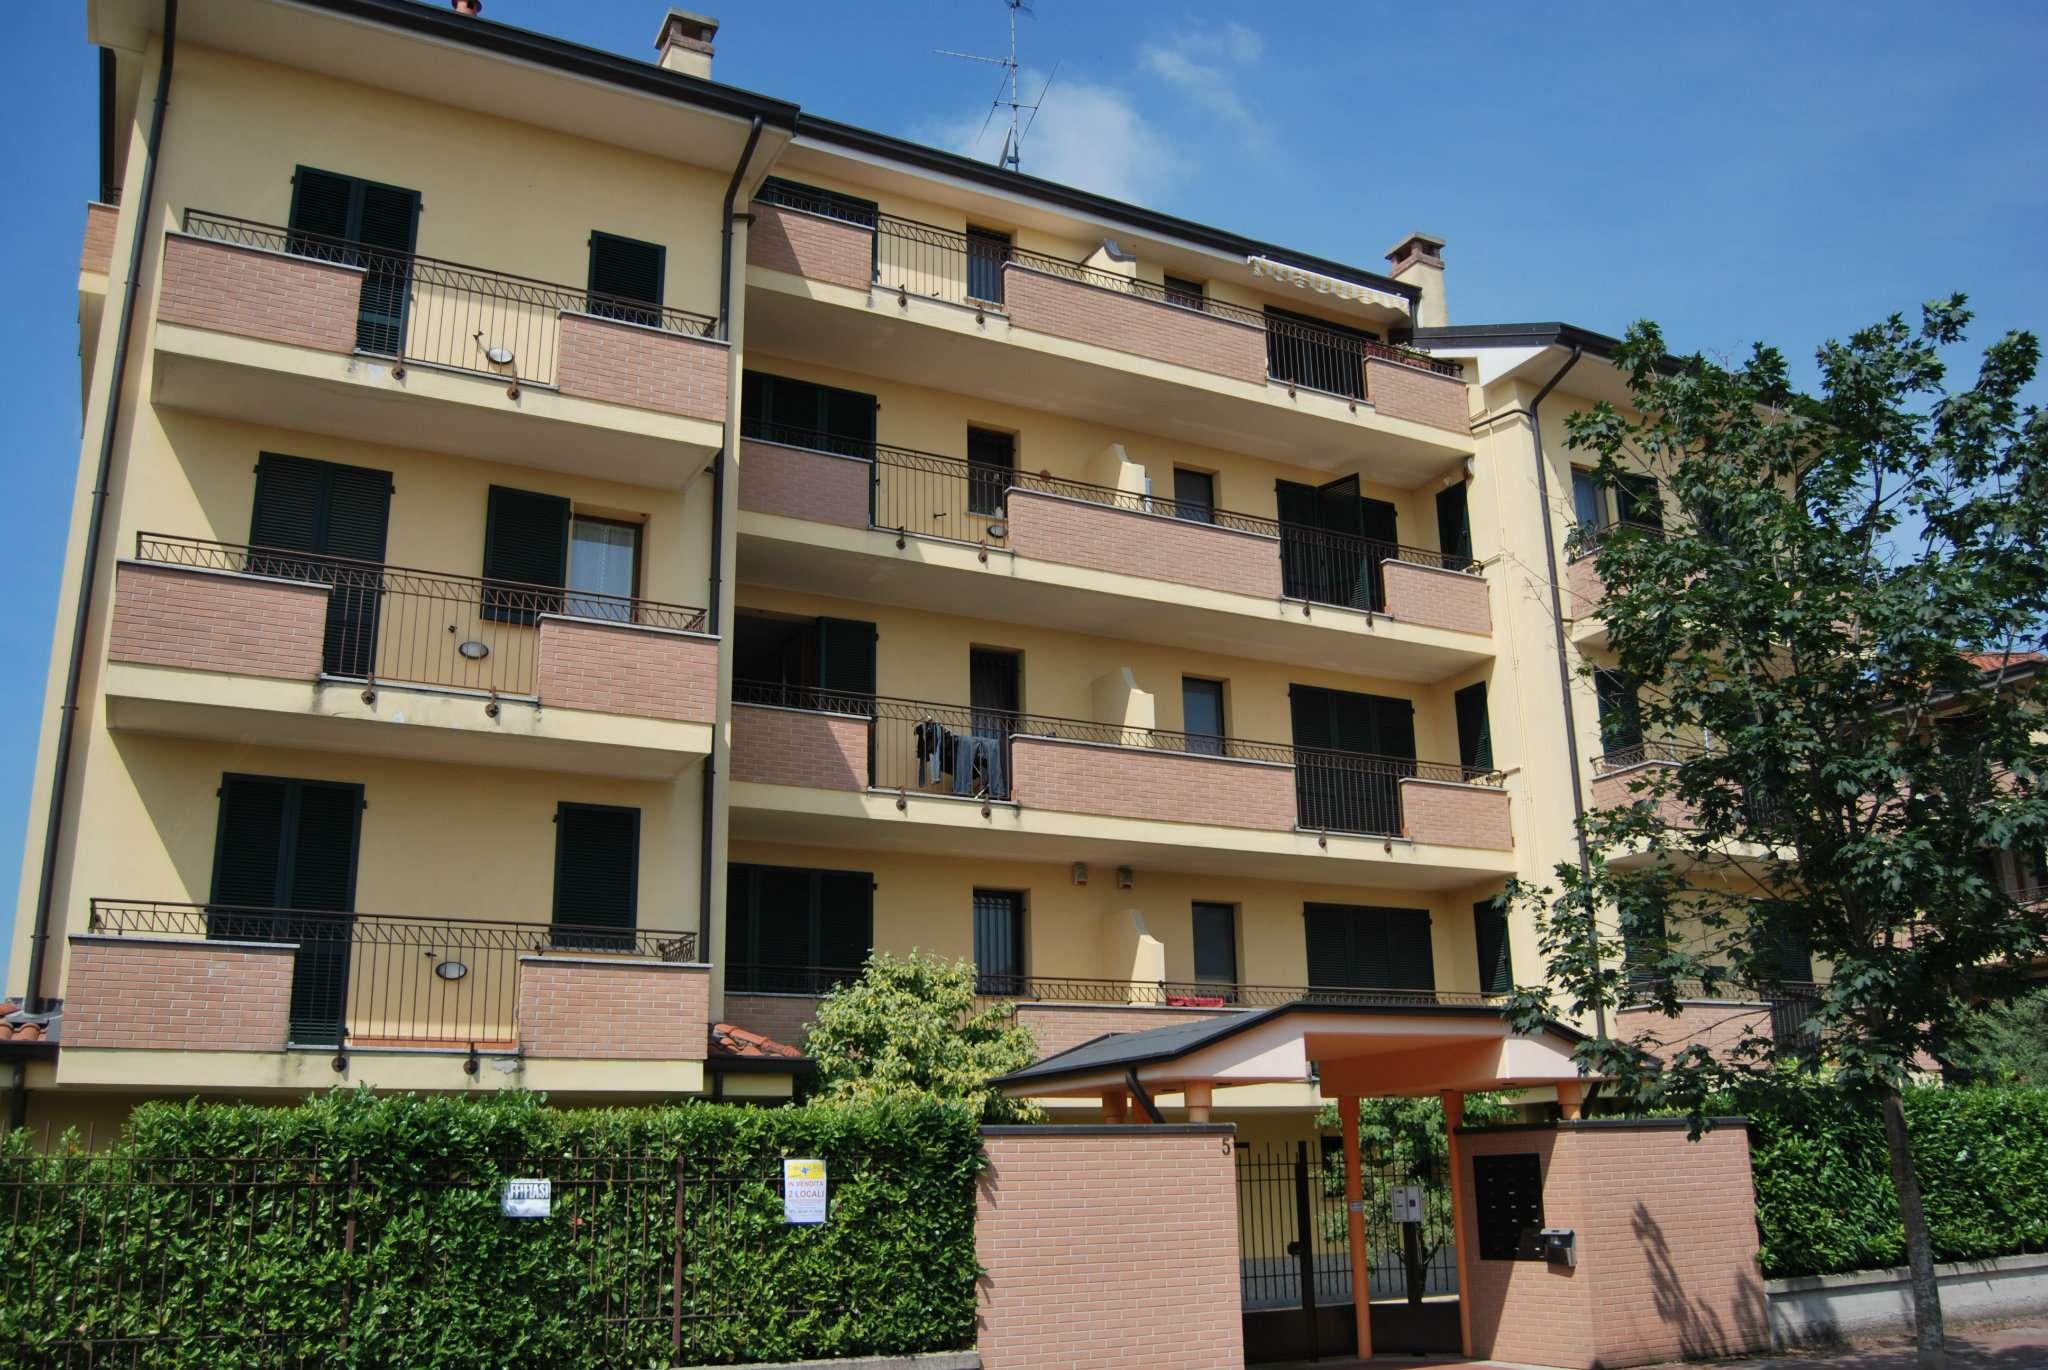 Bilocale Pregnana Milanese Via Trento 1